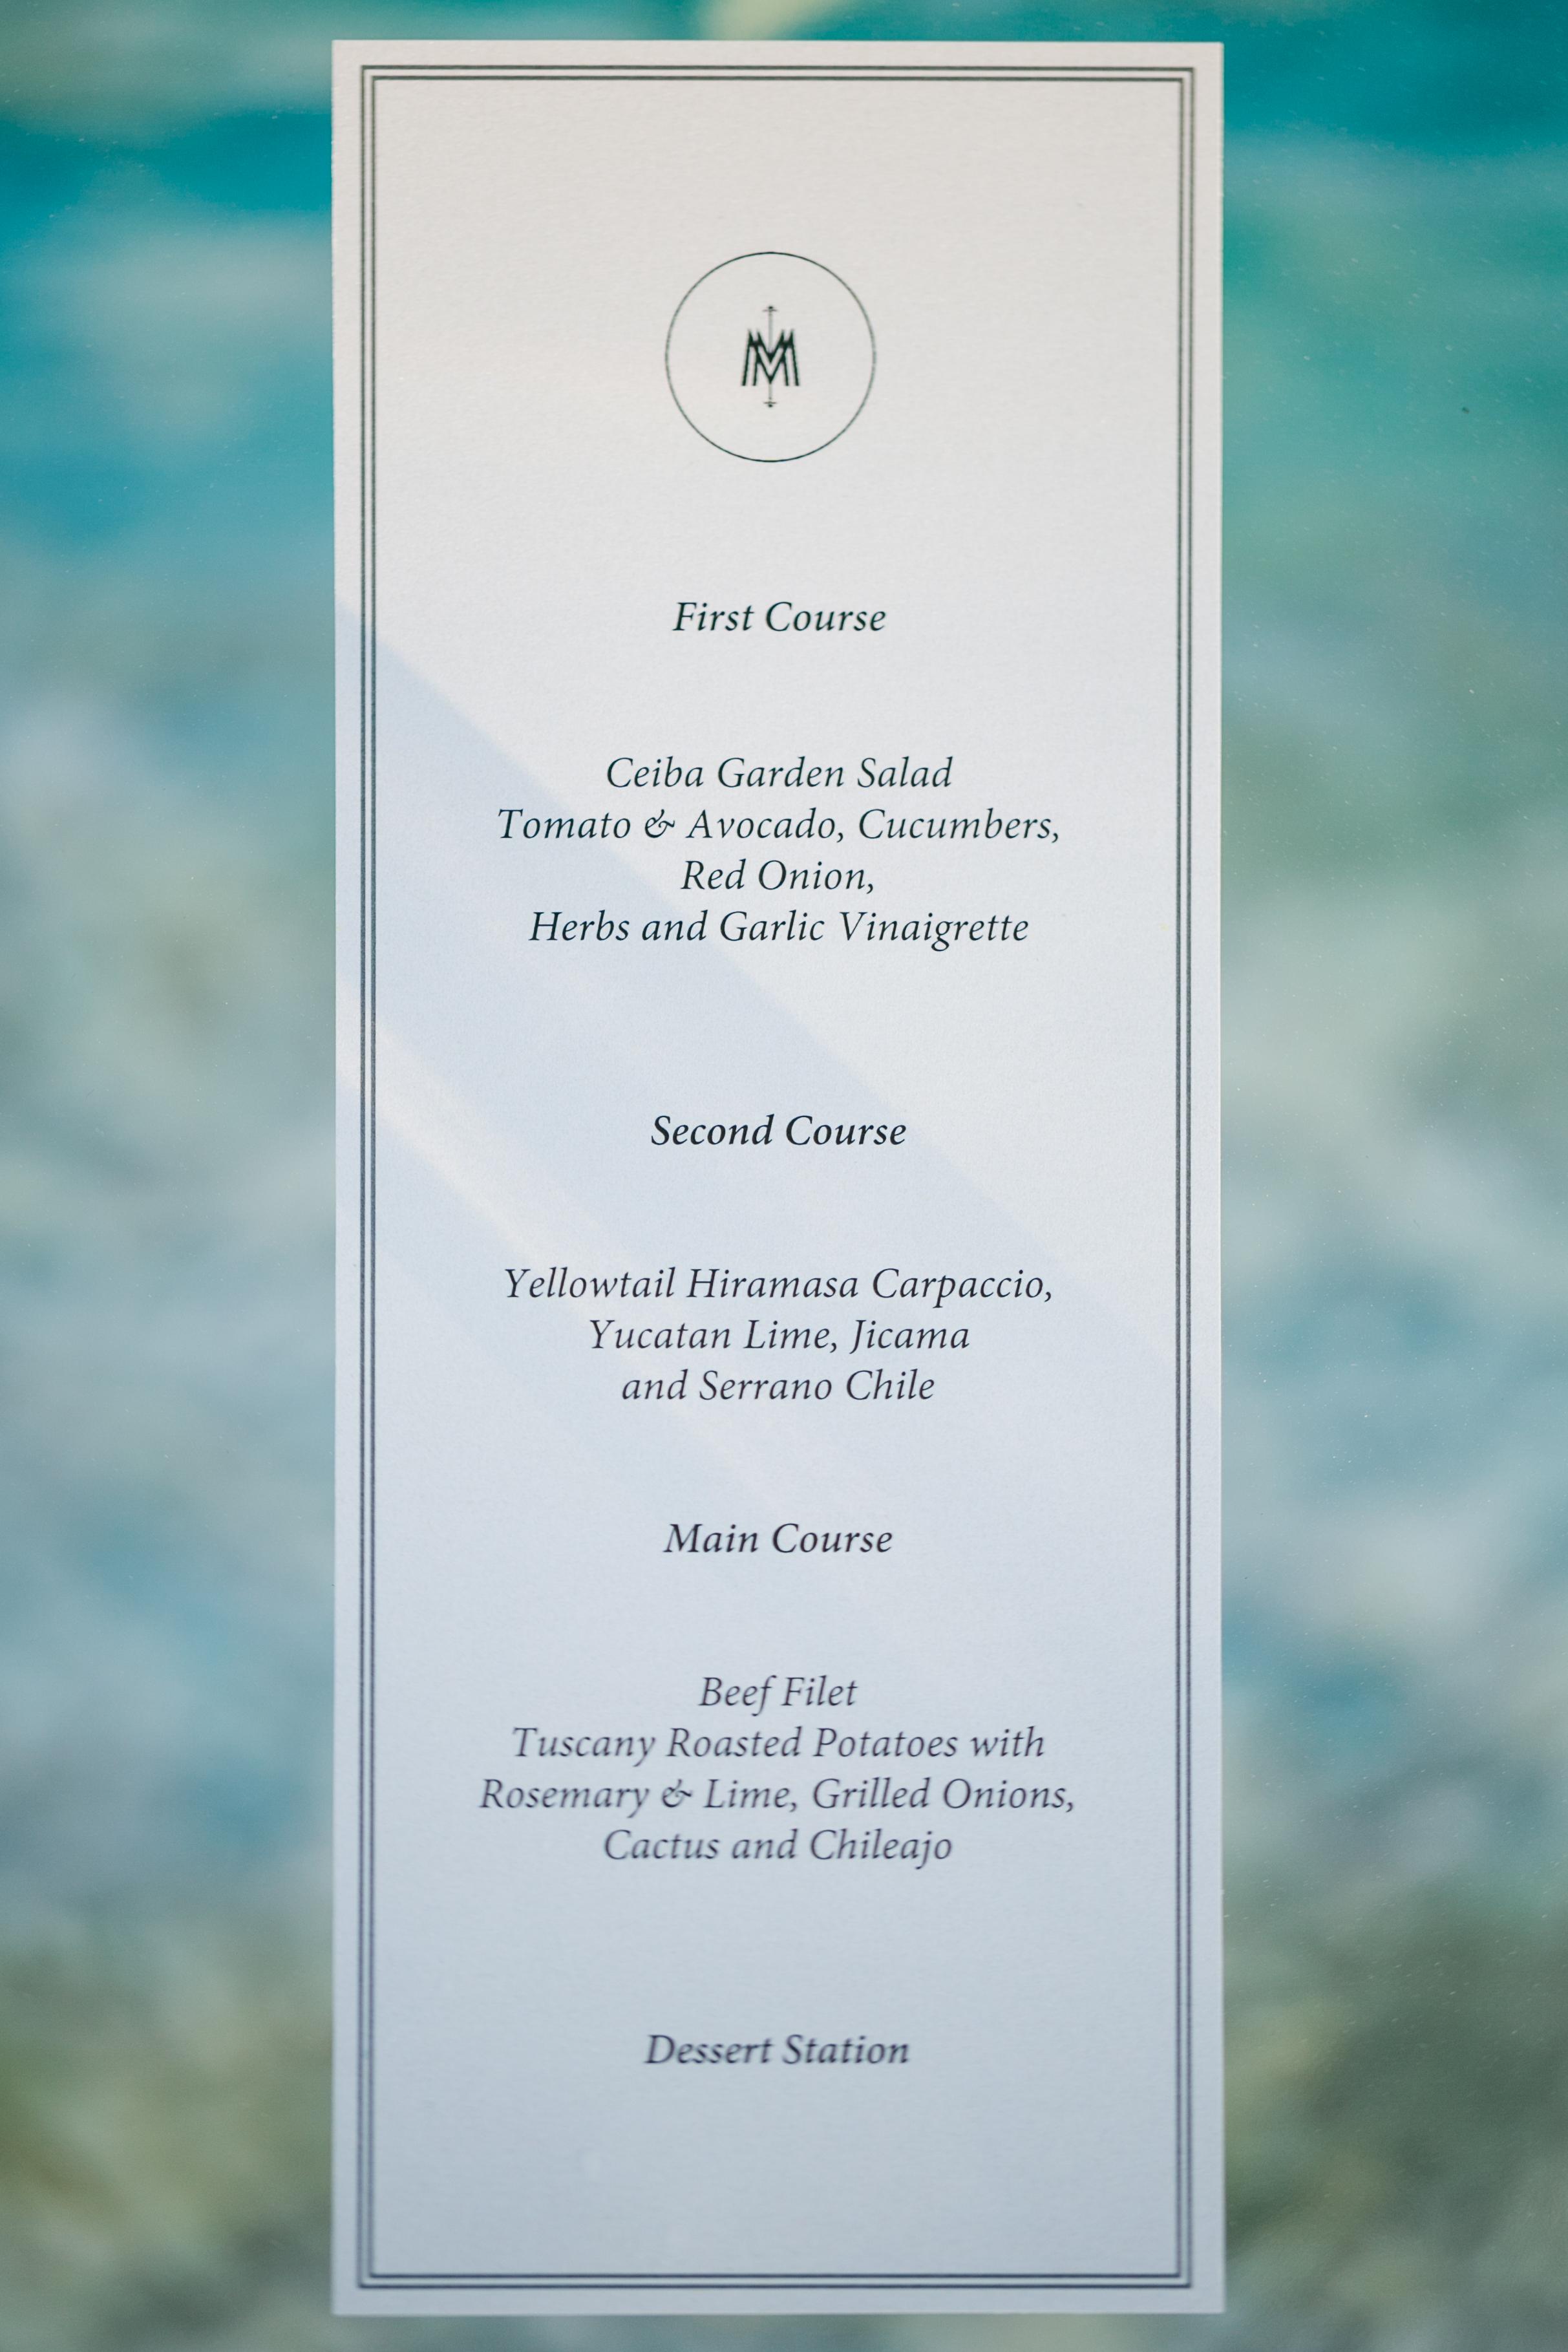 Riviera Maya Getaway: Dinner on the Sand - Elegant Occasions by JoAnn Gregoli